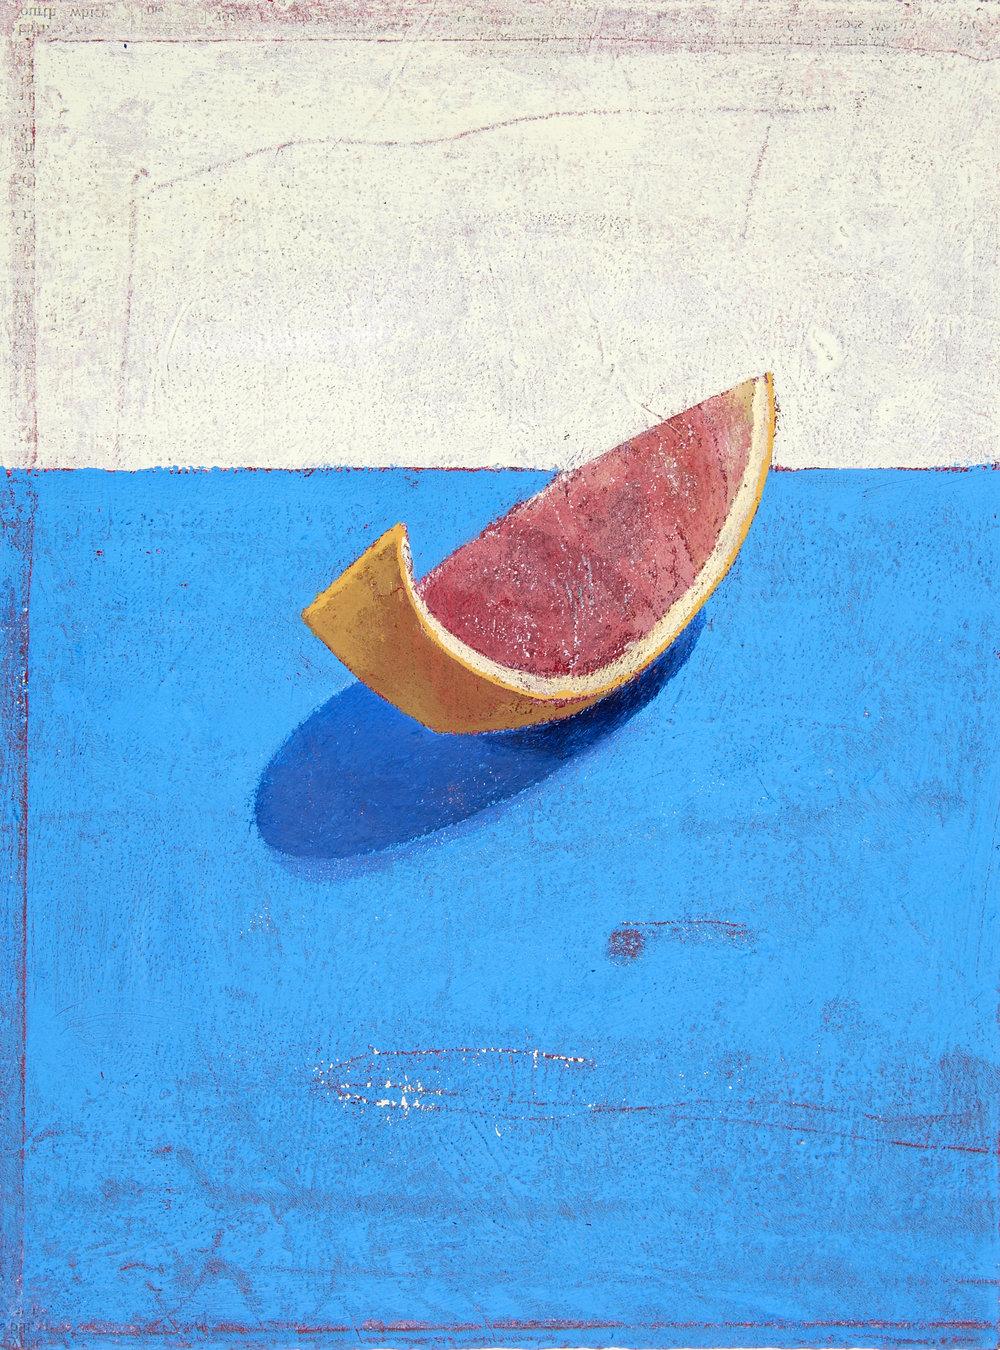 Blue Orange Peel Segment